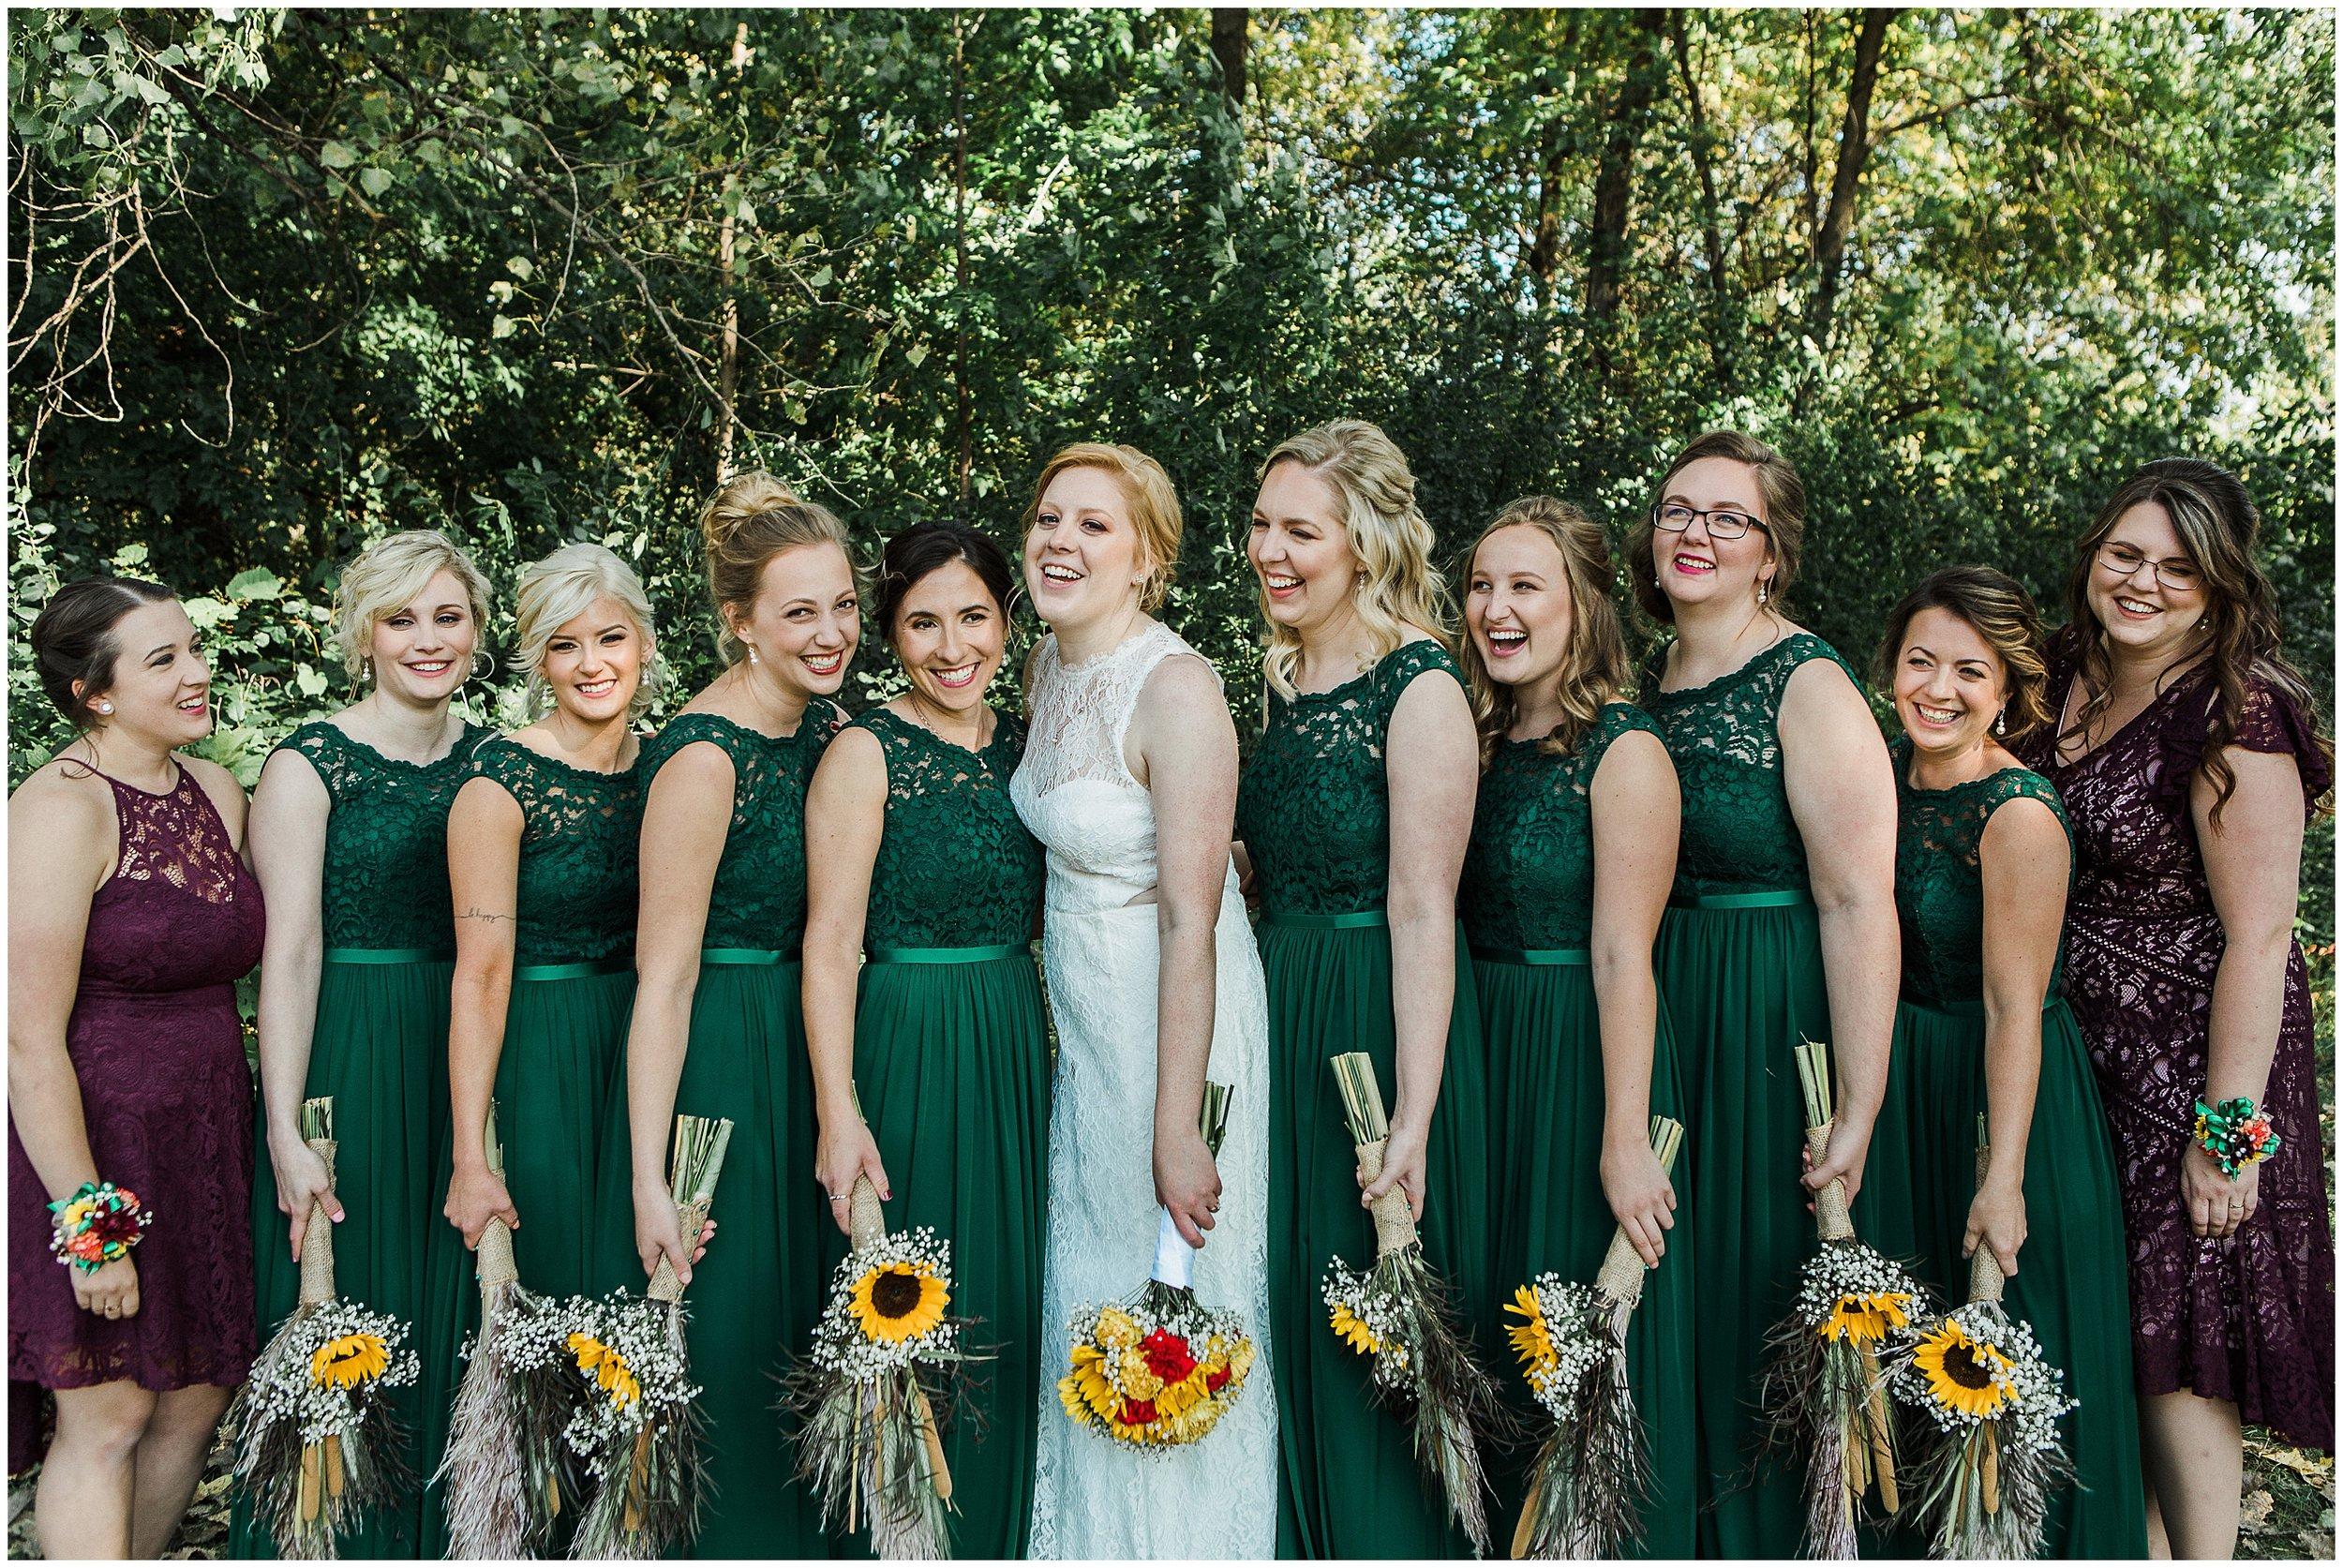 Lauren Baker Photography MN wedding photographer Eagan Community Center Wedding